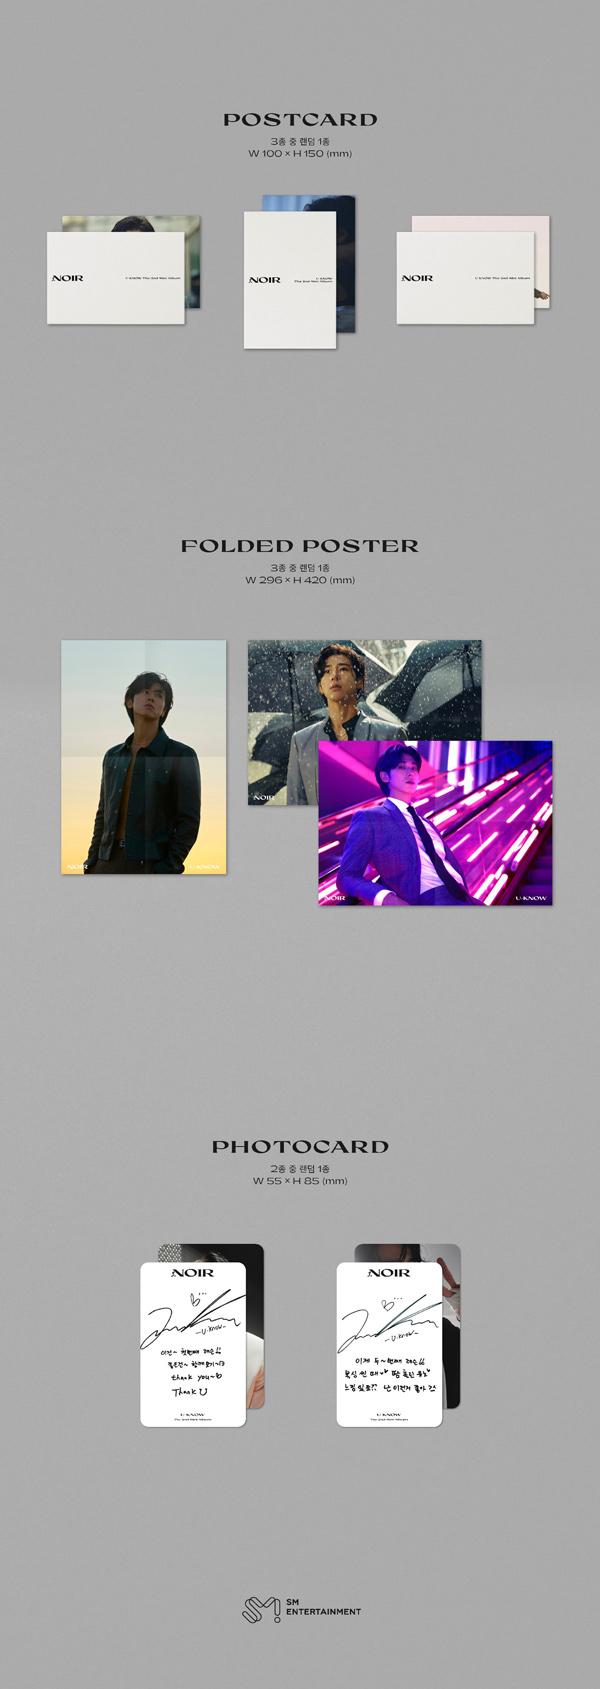 U-KNOW 유노윤호 The 2nd Mini Album [NOIR] Crank Up Ver. - Album Details #3